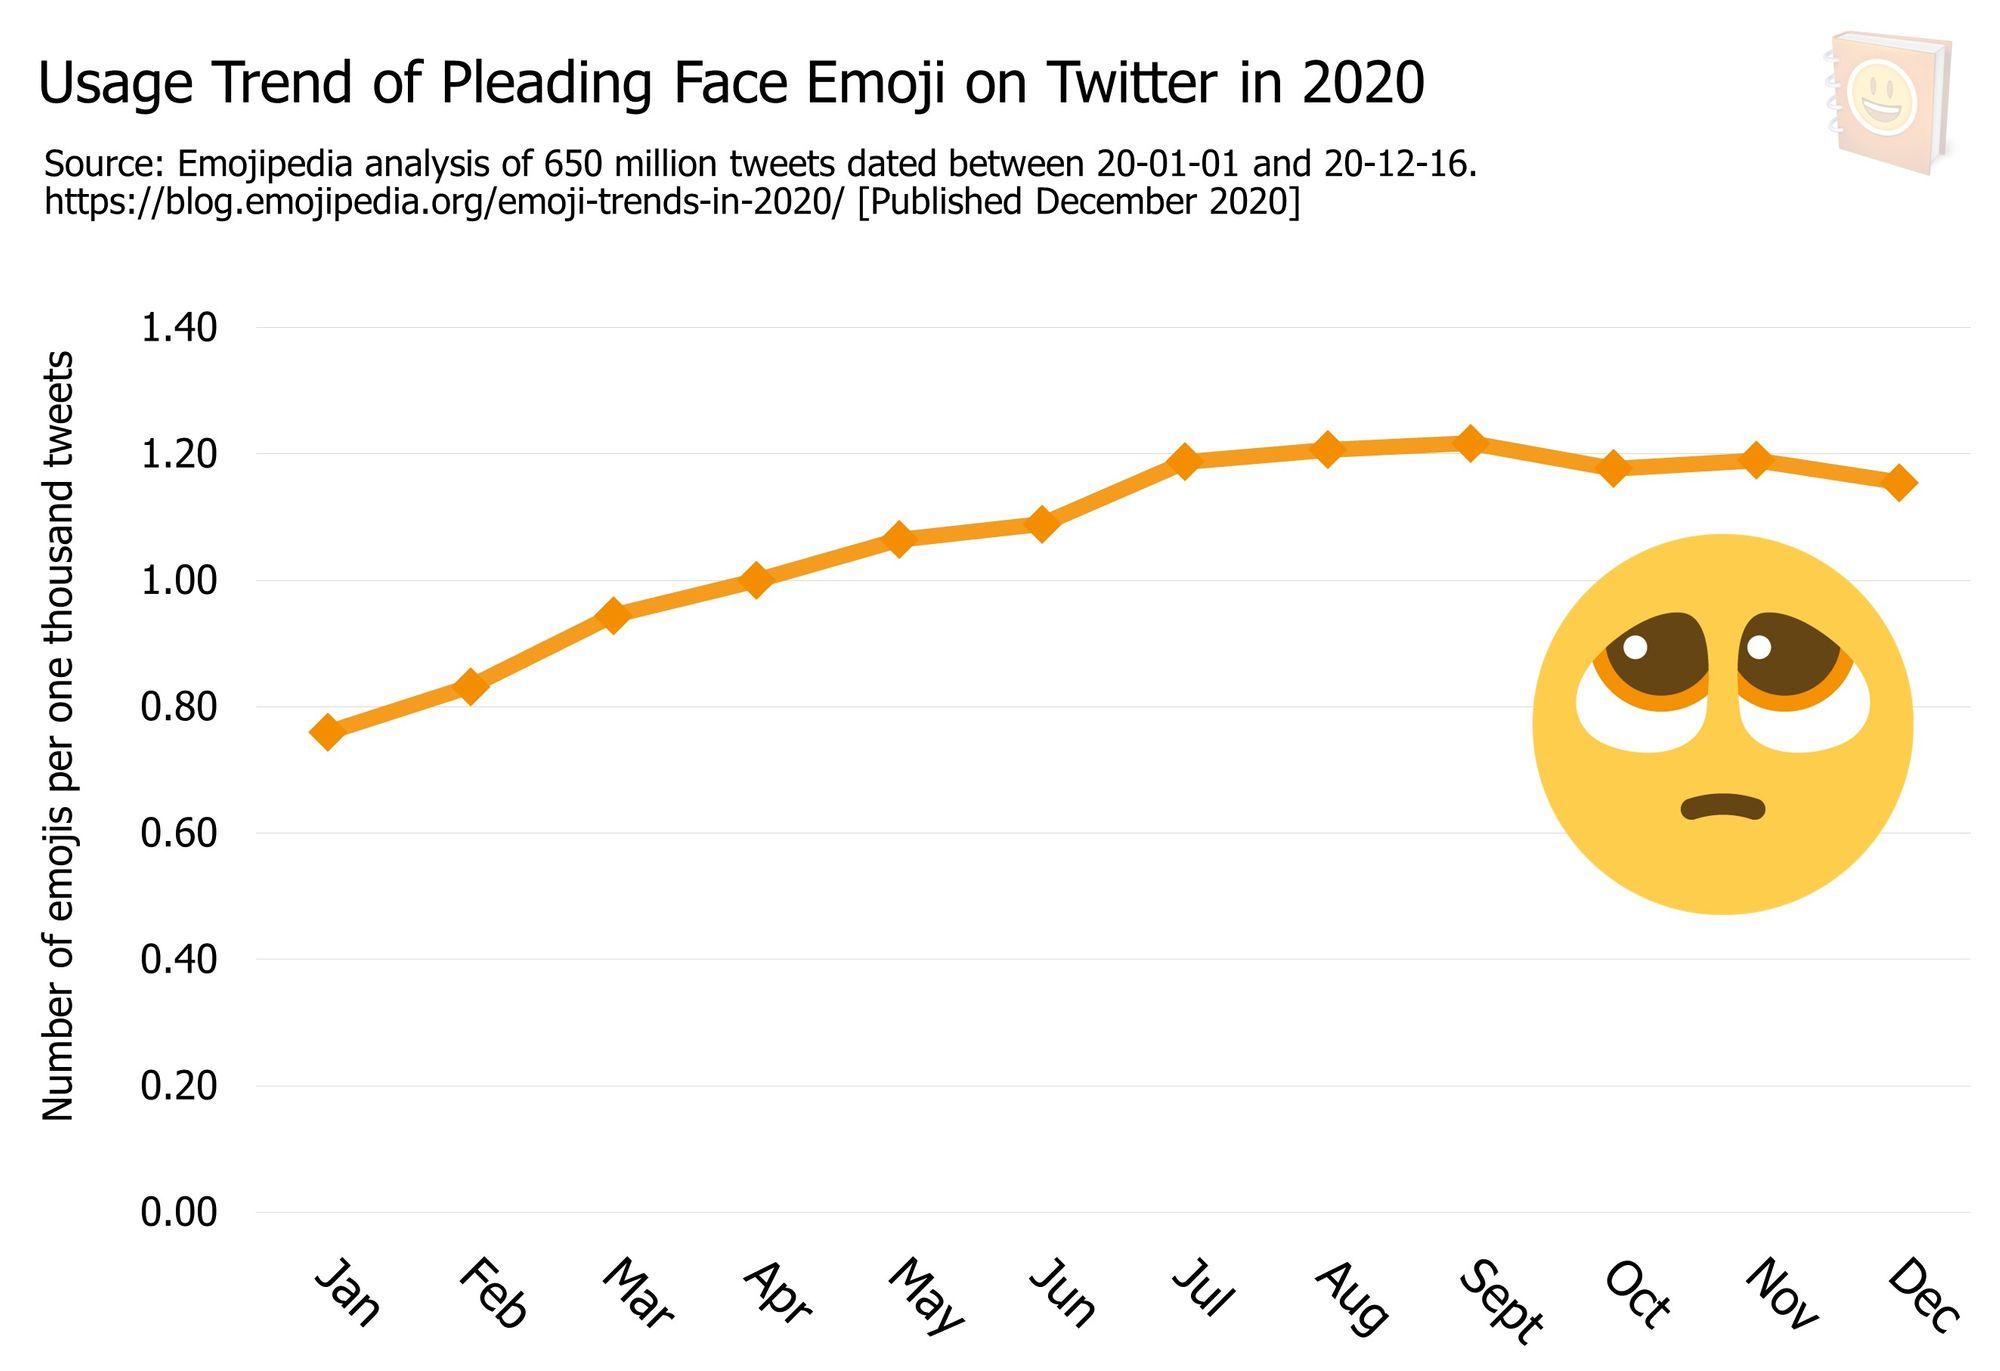 Emoji-Trends-In-2020---Usage-Trend-of-Pleading-Face-Emoji-on-Twitter-in-2020